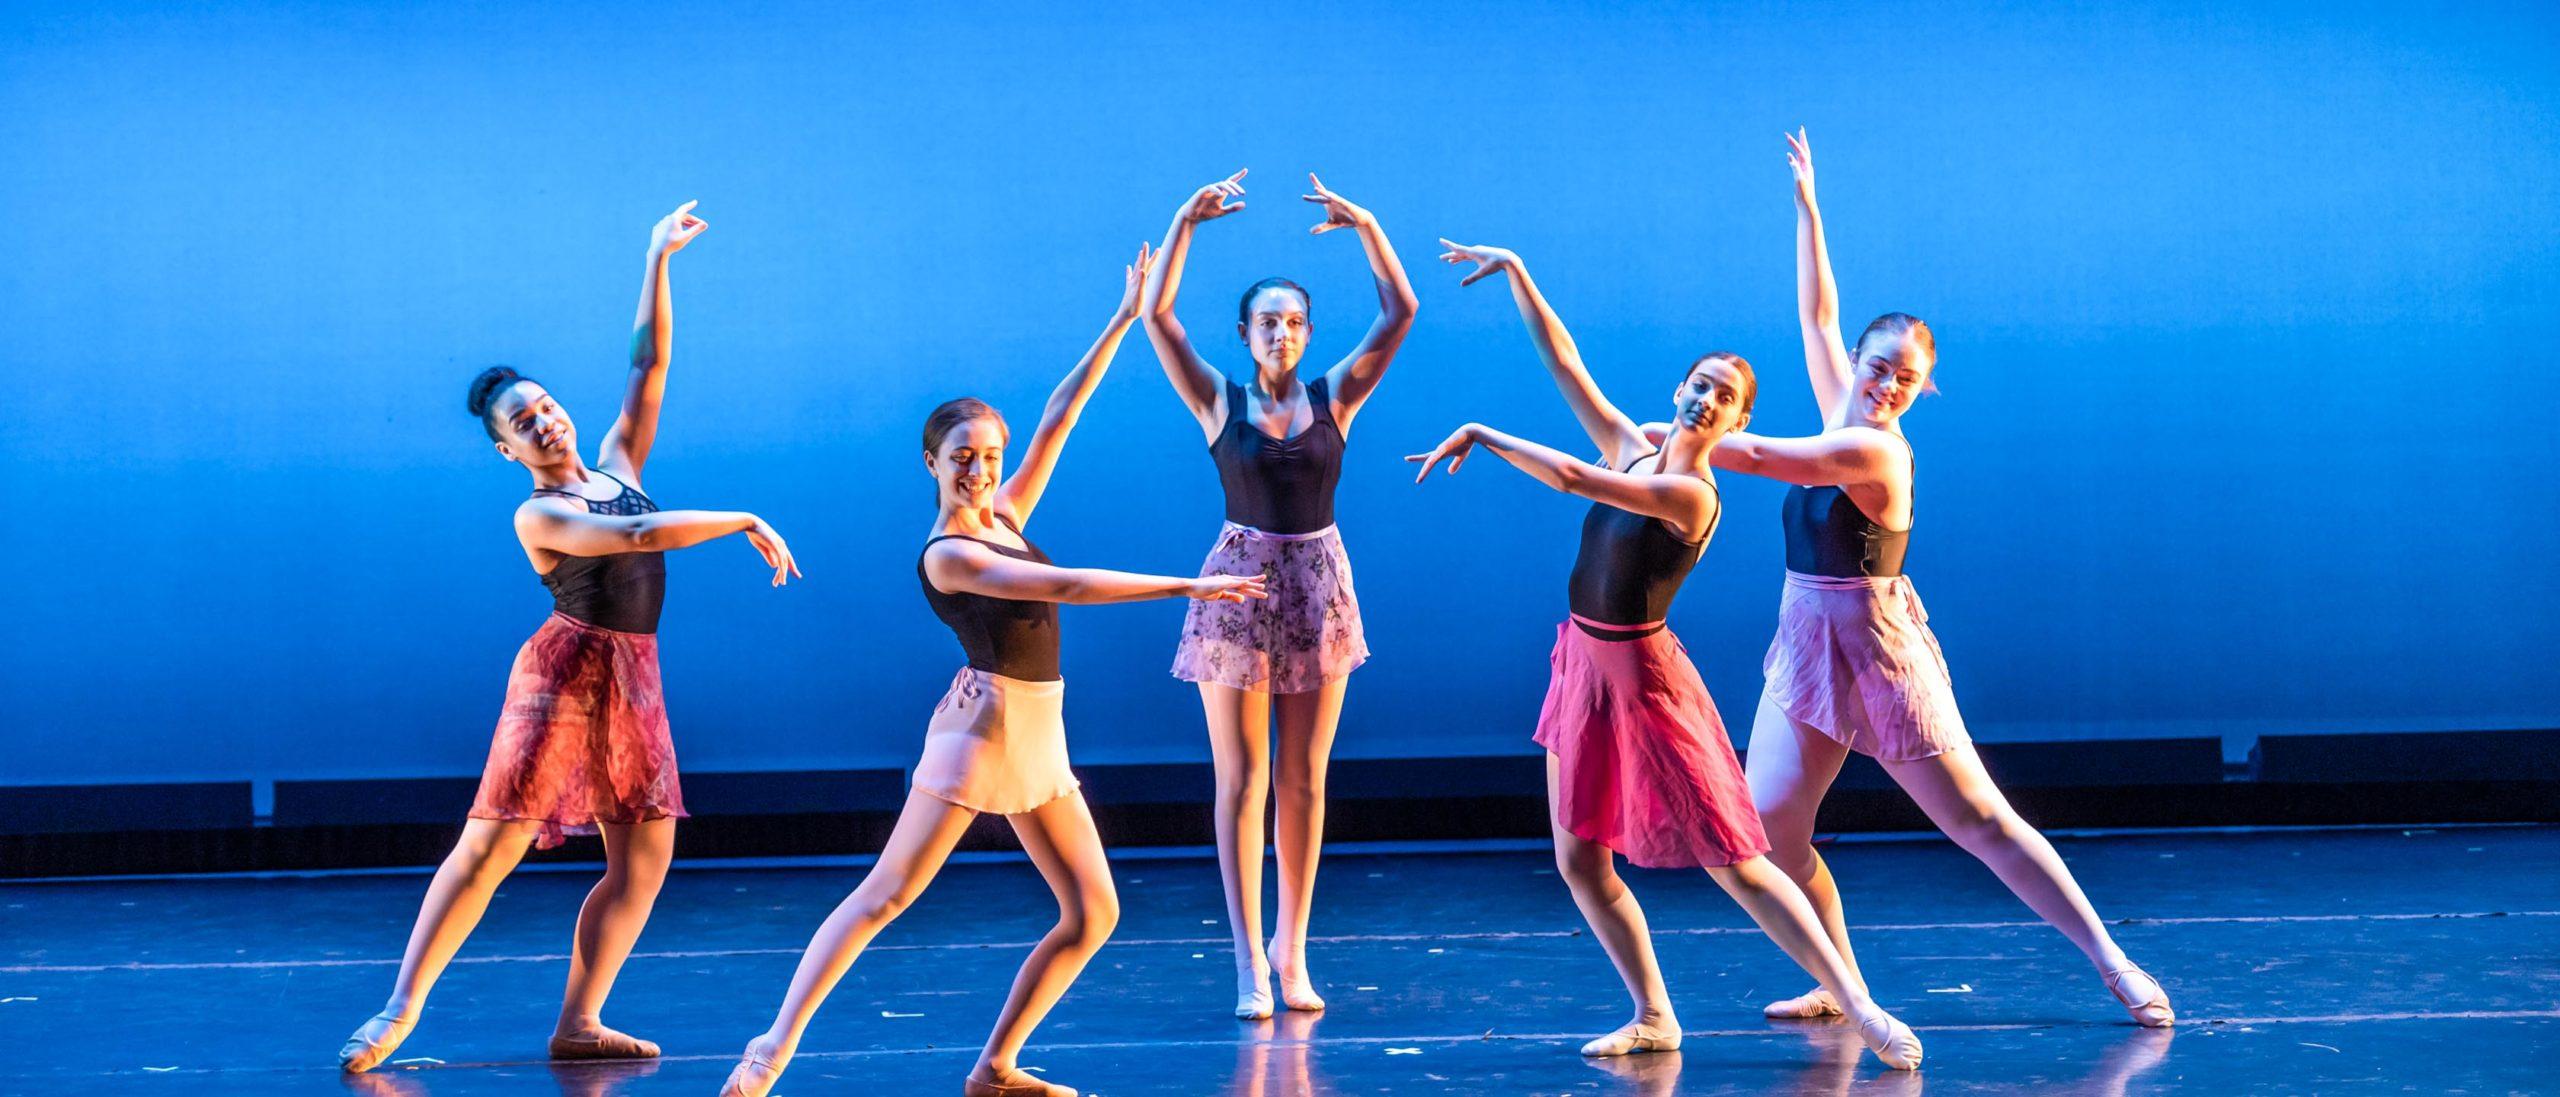 Student ballet performance